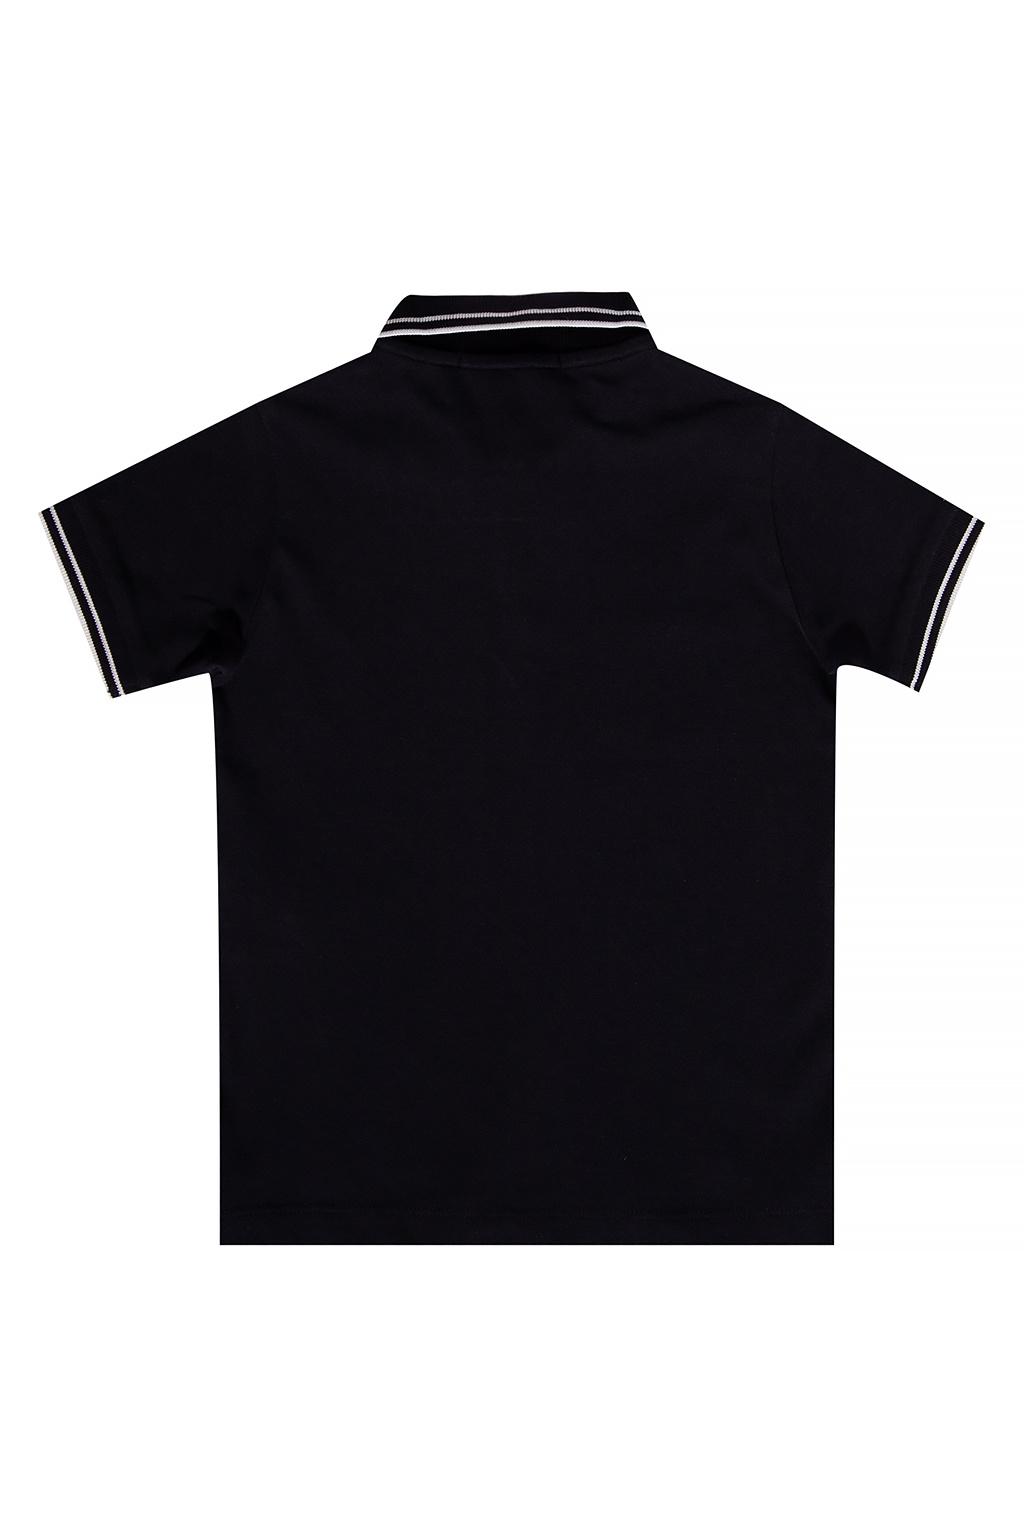 Stone Island Kids Polo shirt with logo